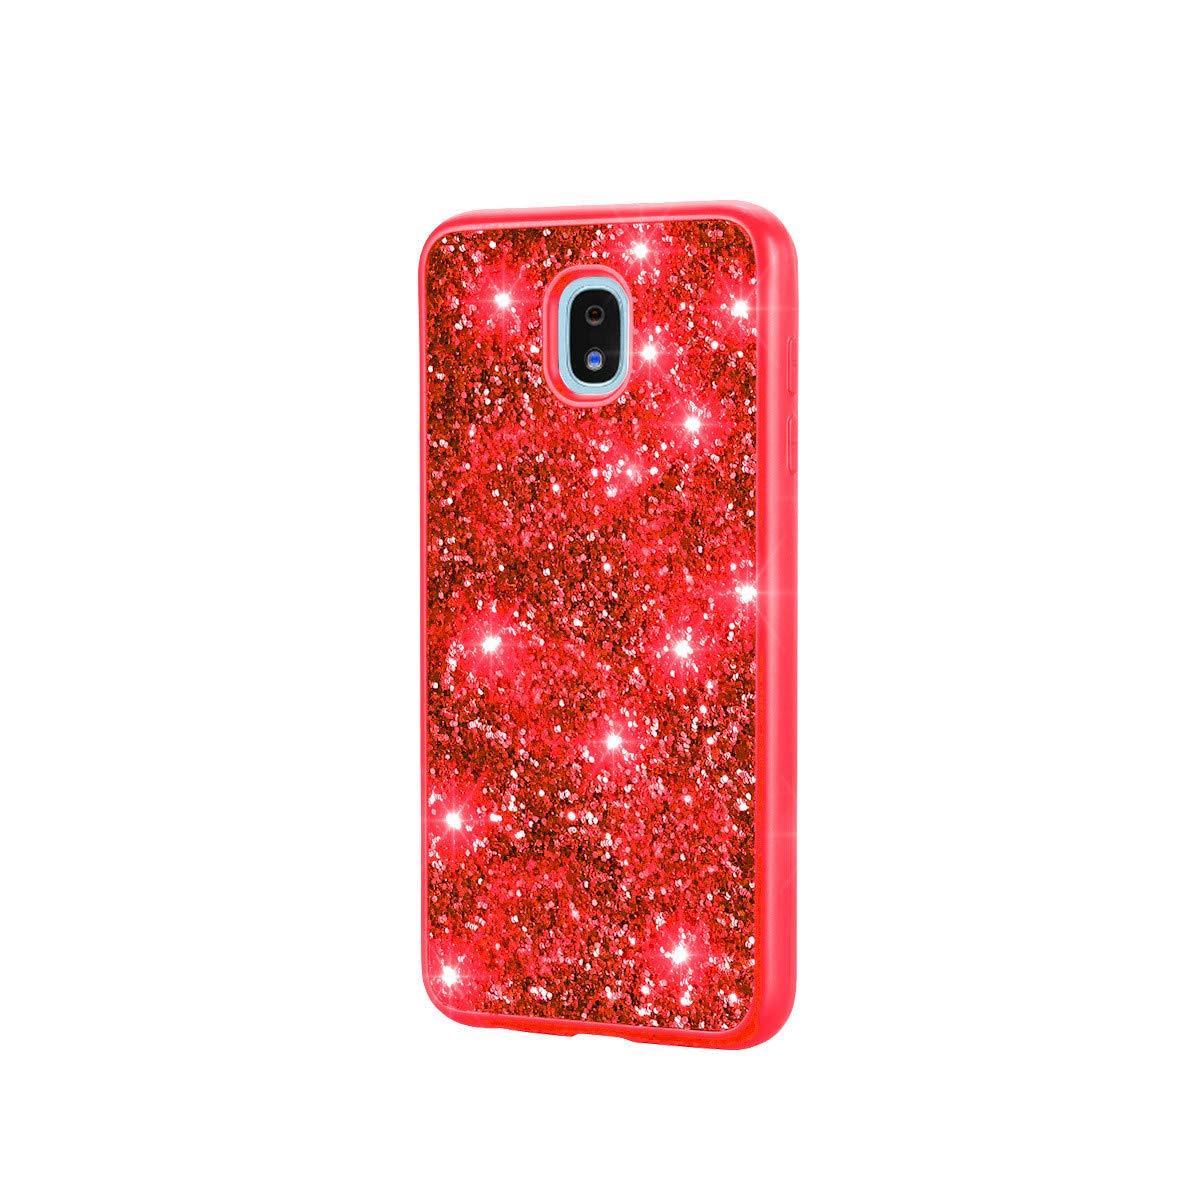 Sainagce Etui Coque Samsung Galaxy J7 2018,Housse en TPU Premium Diamant Scintillant Case Etui Coque pour Samsung Galaxy J7 2018